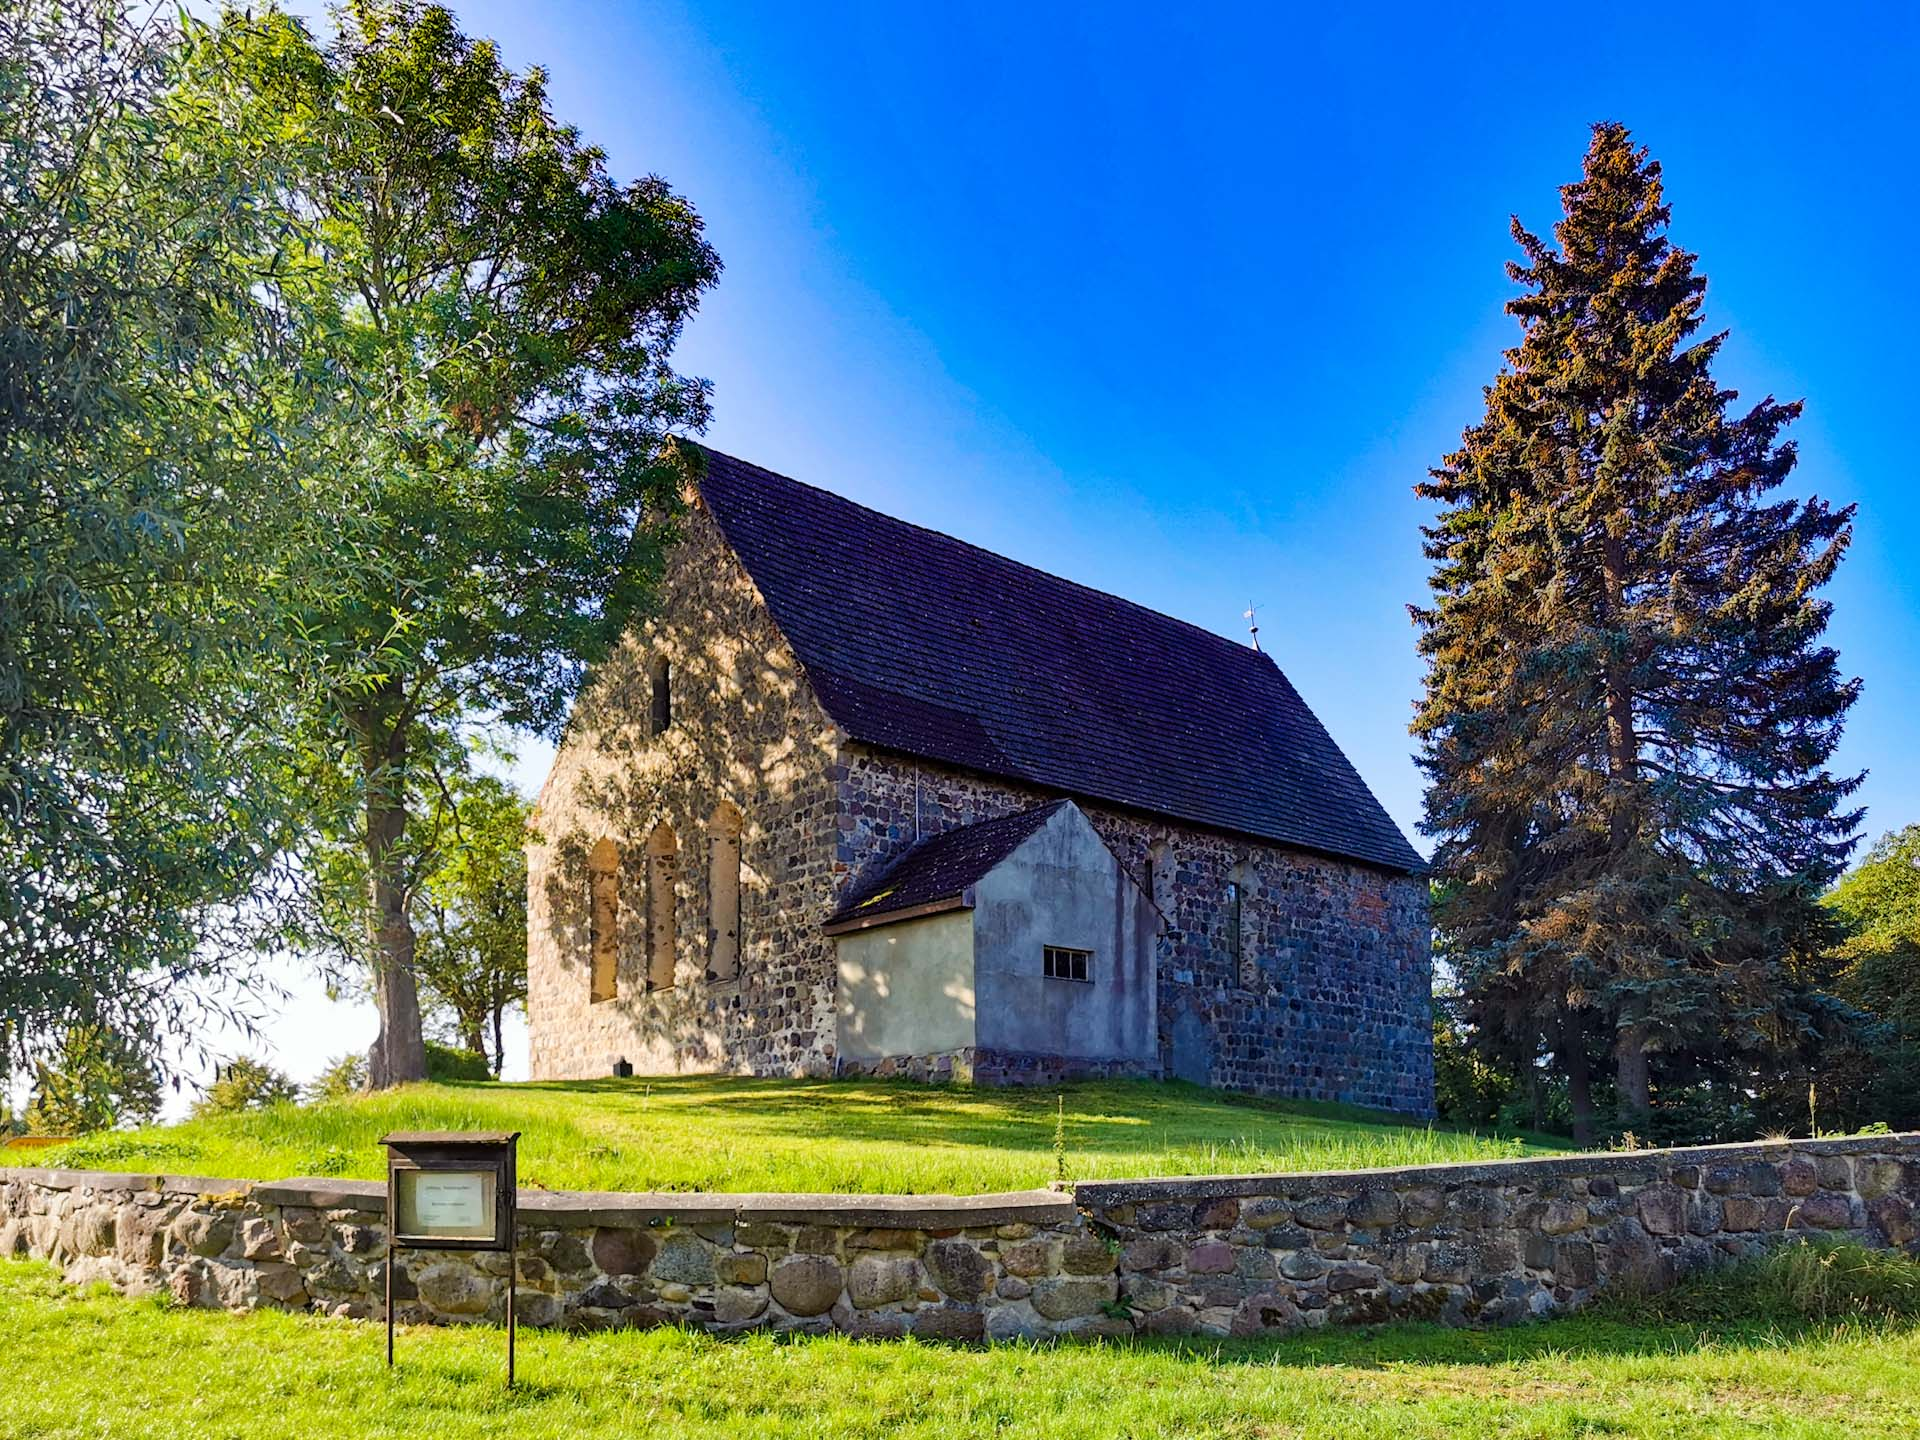 Dorfkirche Mittenwalde UM